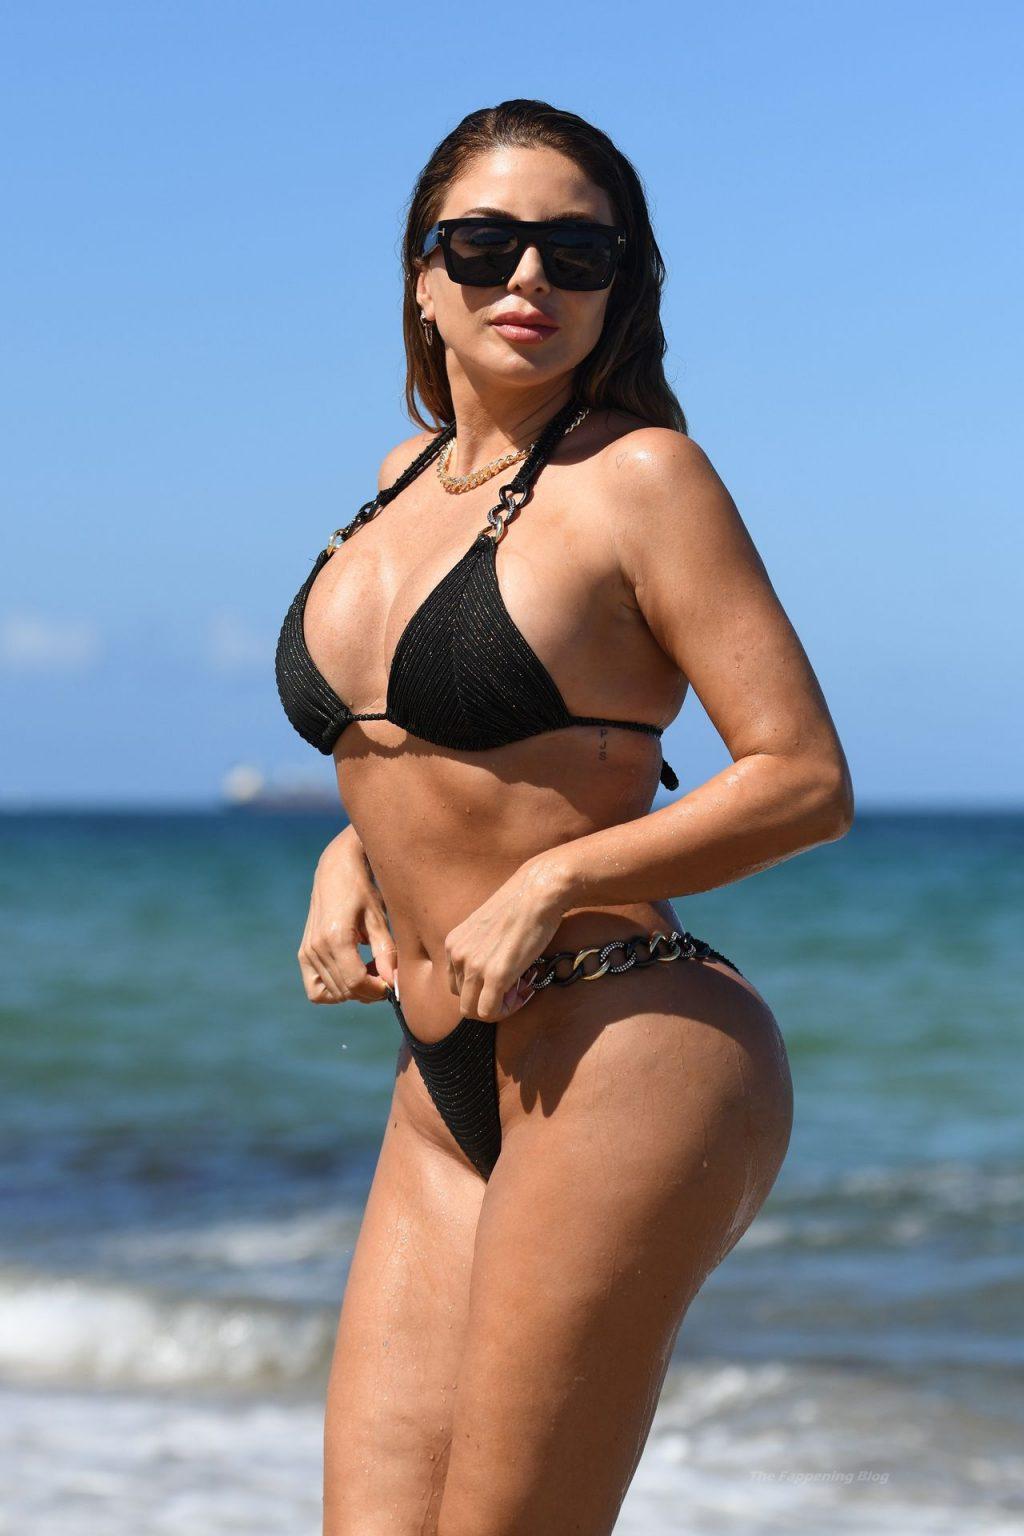 Curvy Larsa Pippen Hits the Beach in Miami (8 Photos)